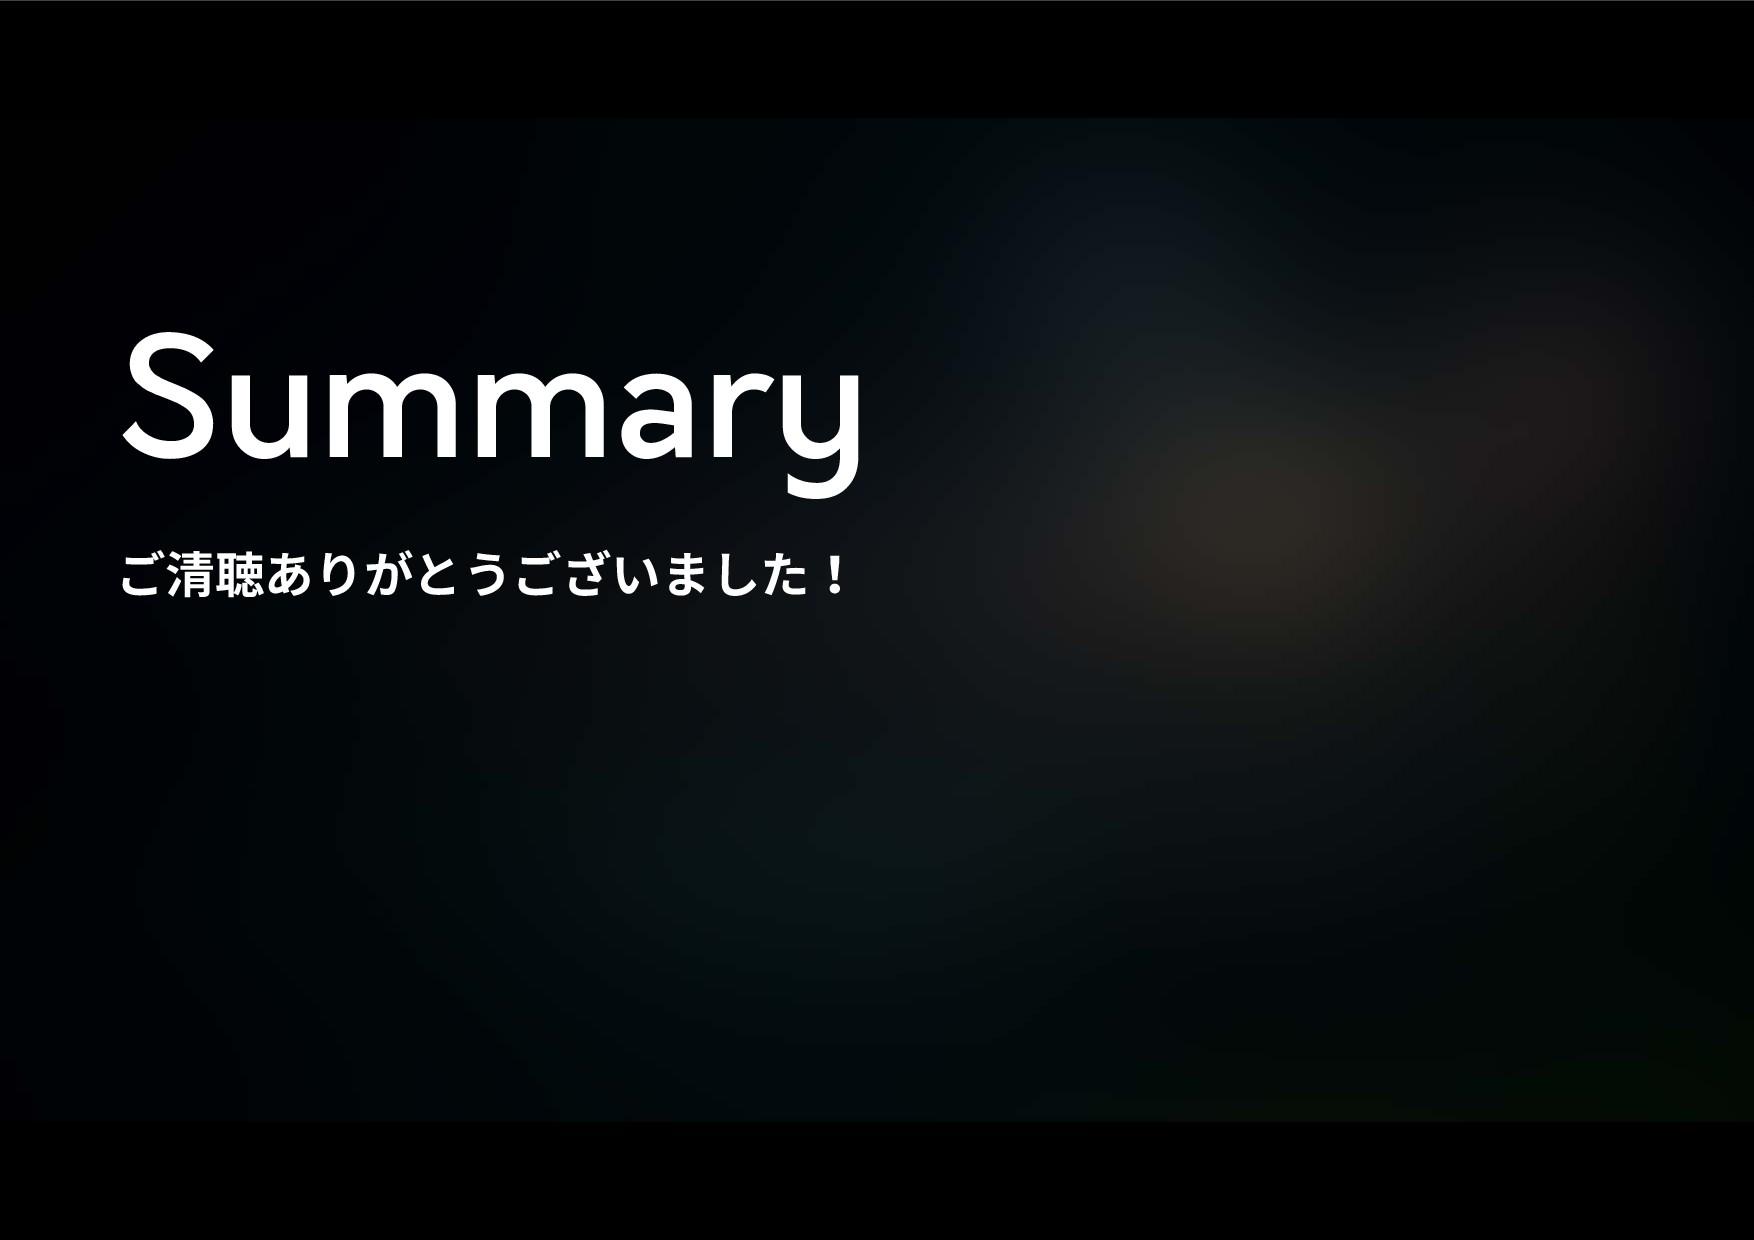 Summary ׀幠耮ָ֮הֲ׀ְׂת׃